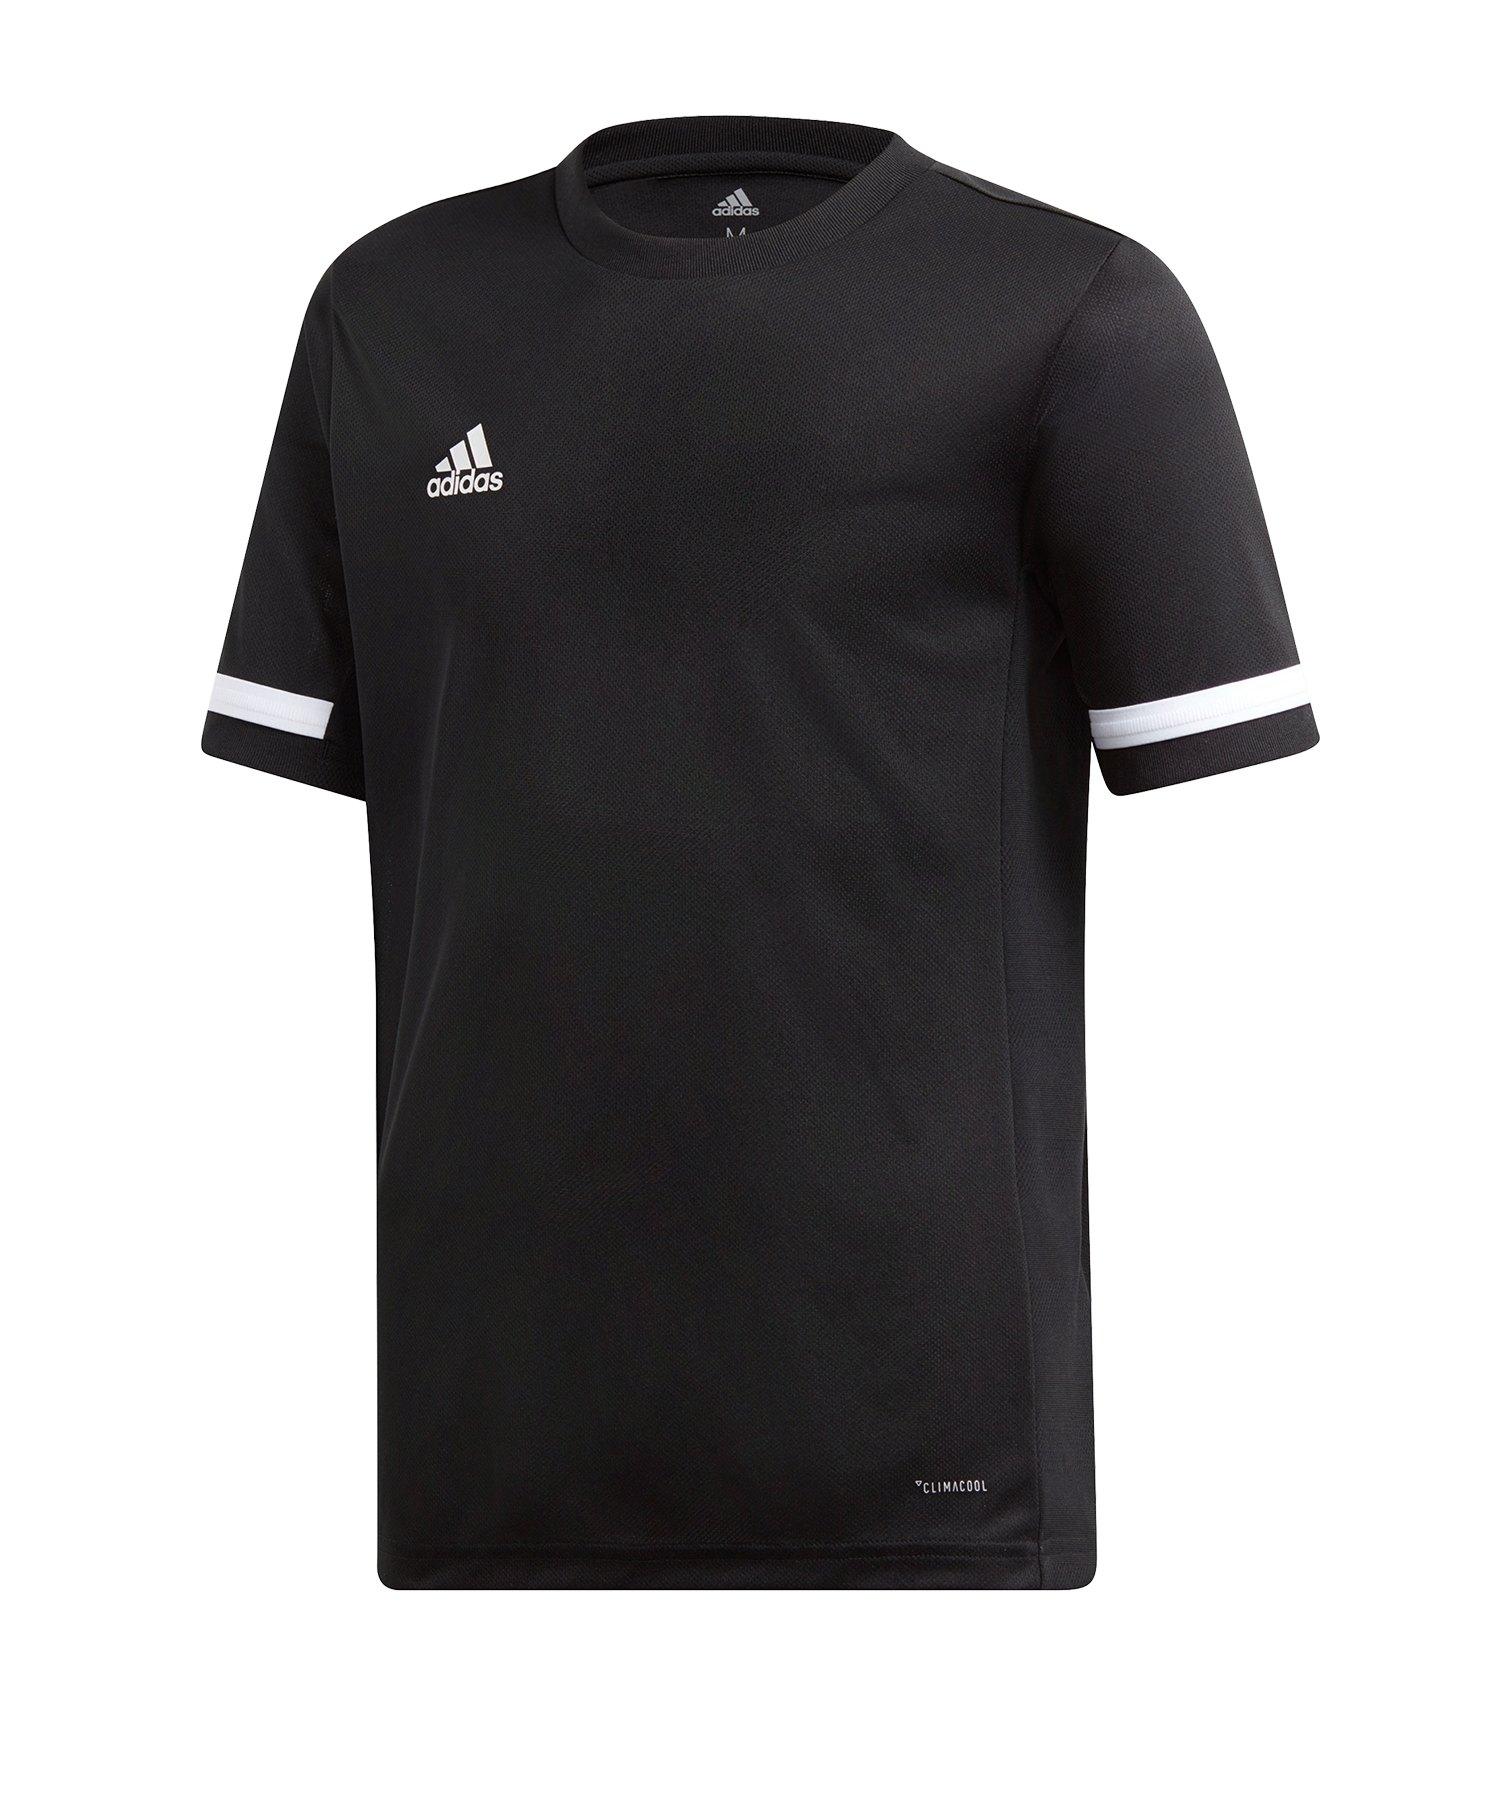 adidas Team 19 Trikot kurzarm Kids Schwarz Weiss - schwarz